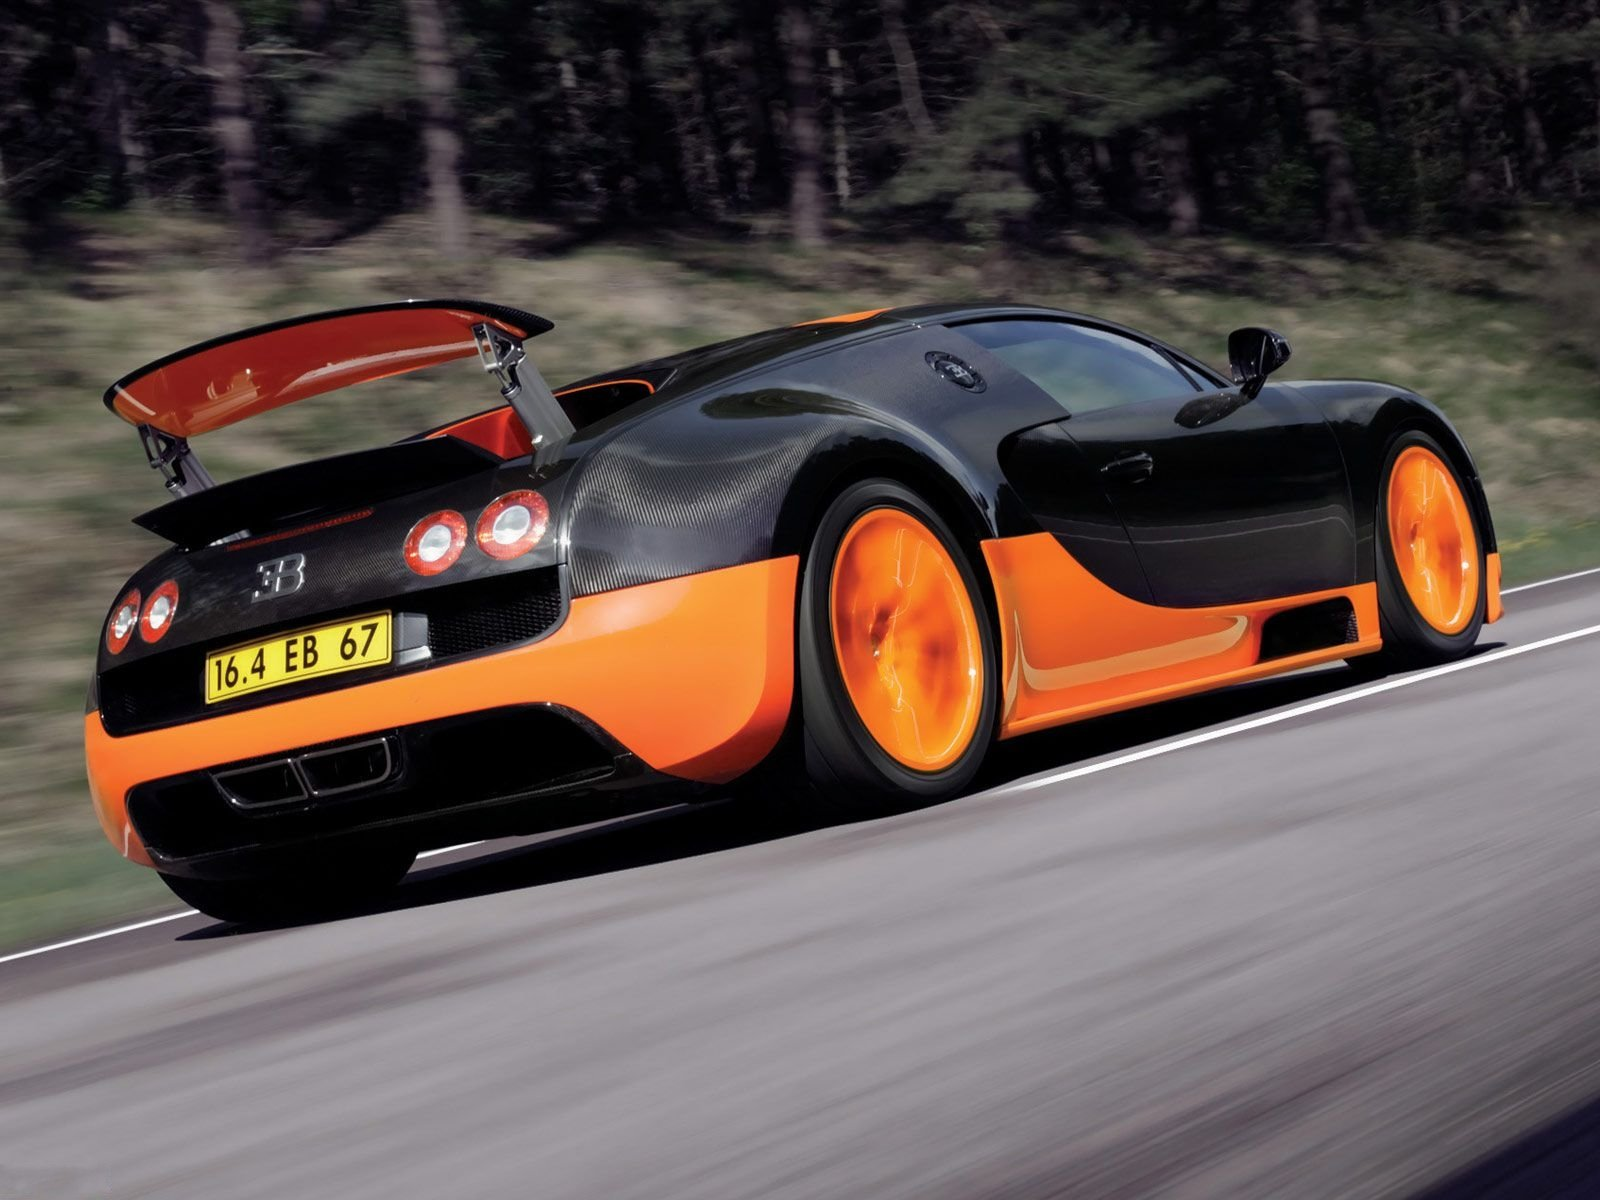 Free Download Bugatti Veyron Background Id298052 Hd 1600x1200 For